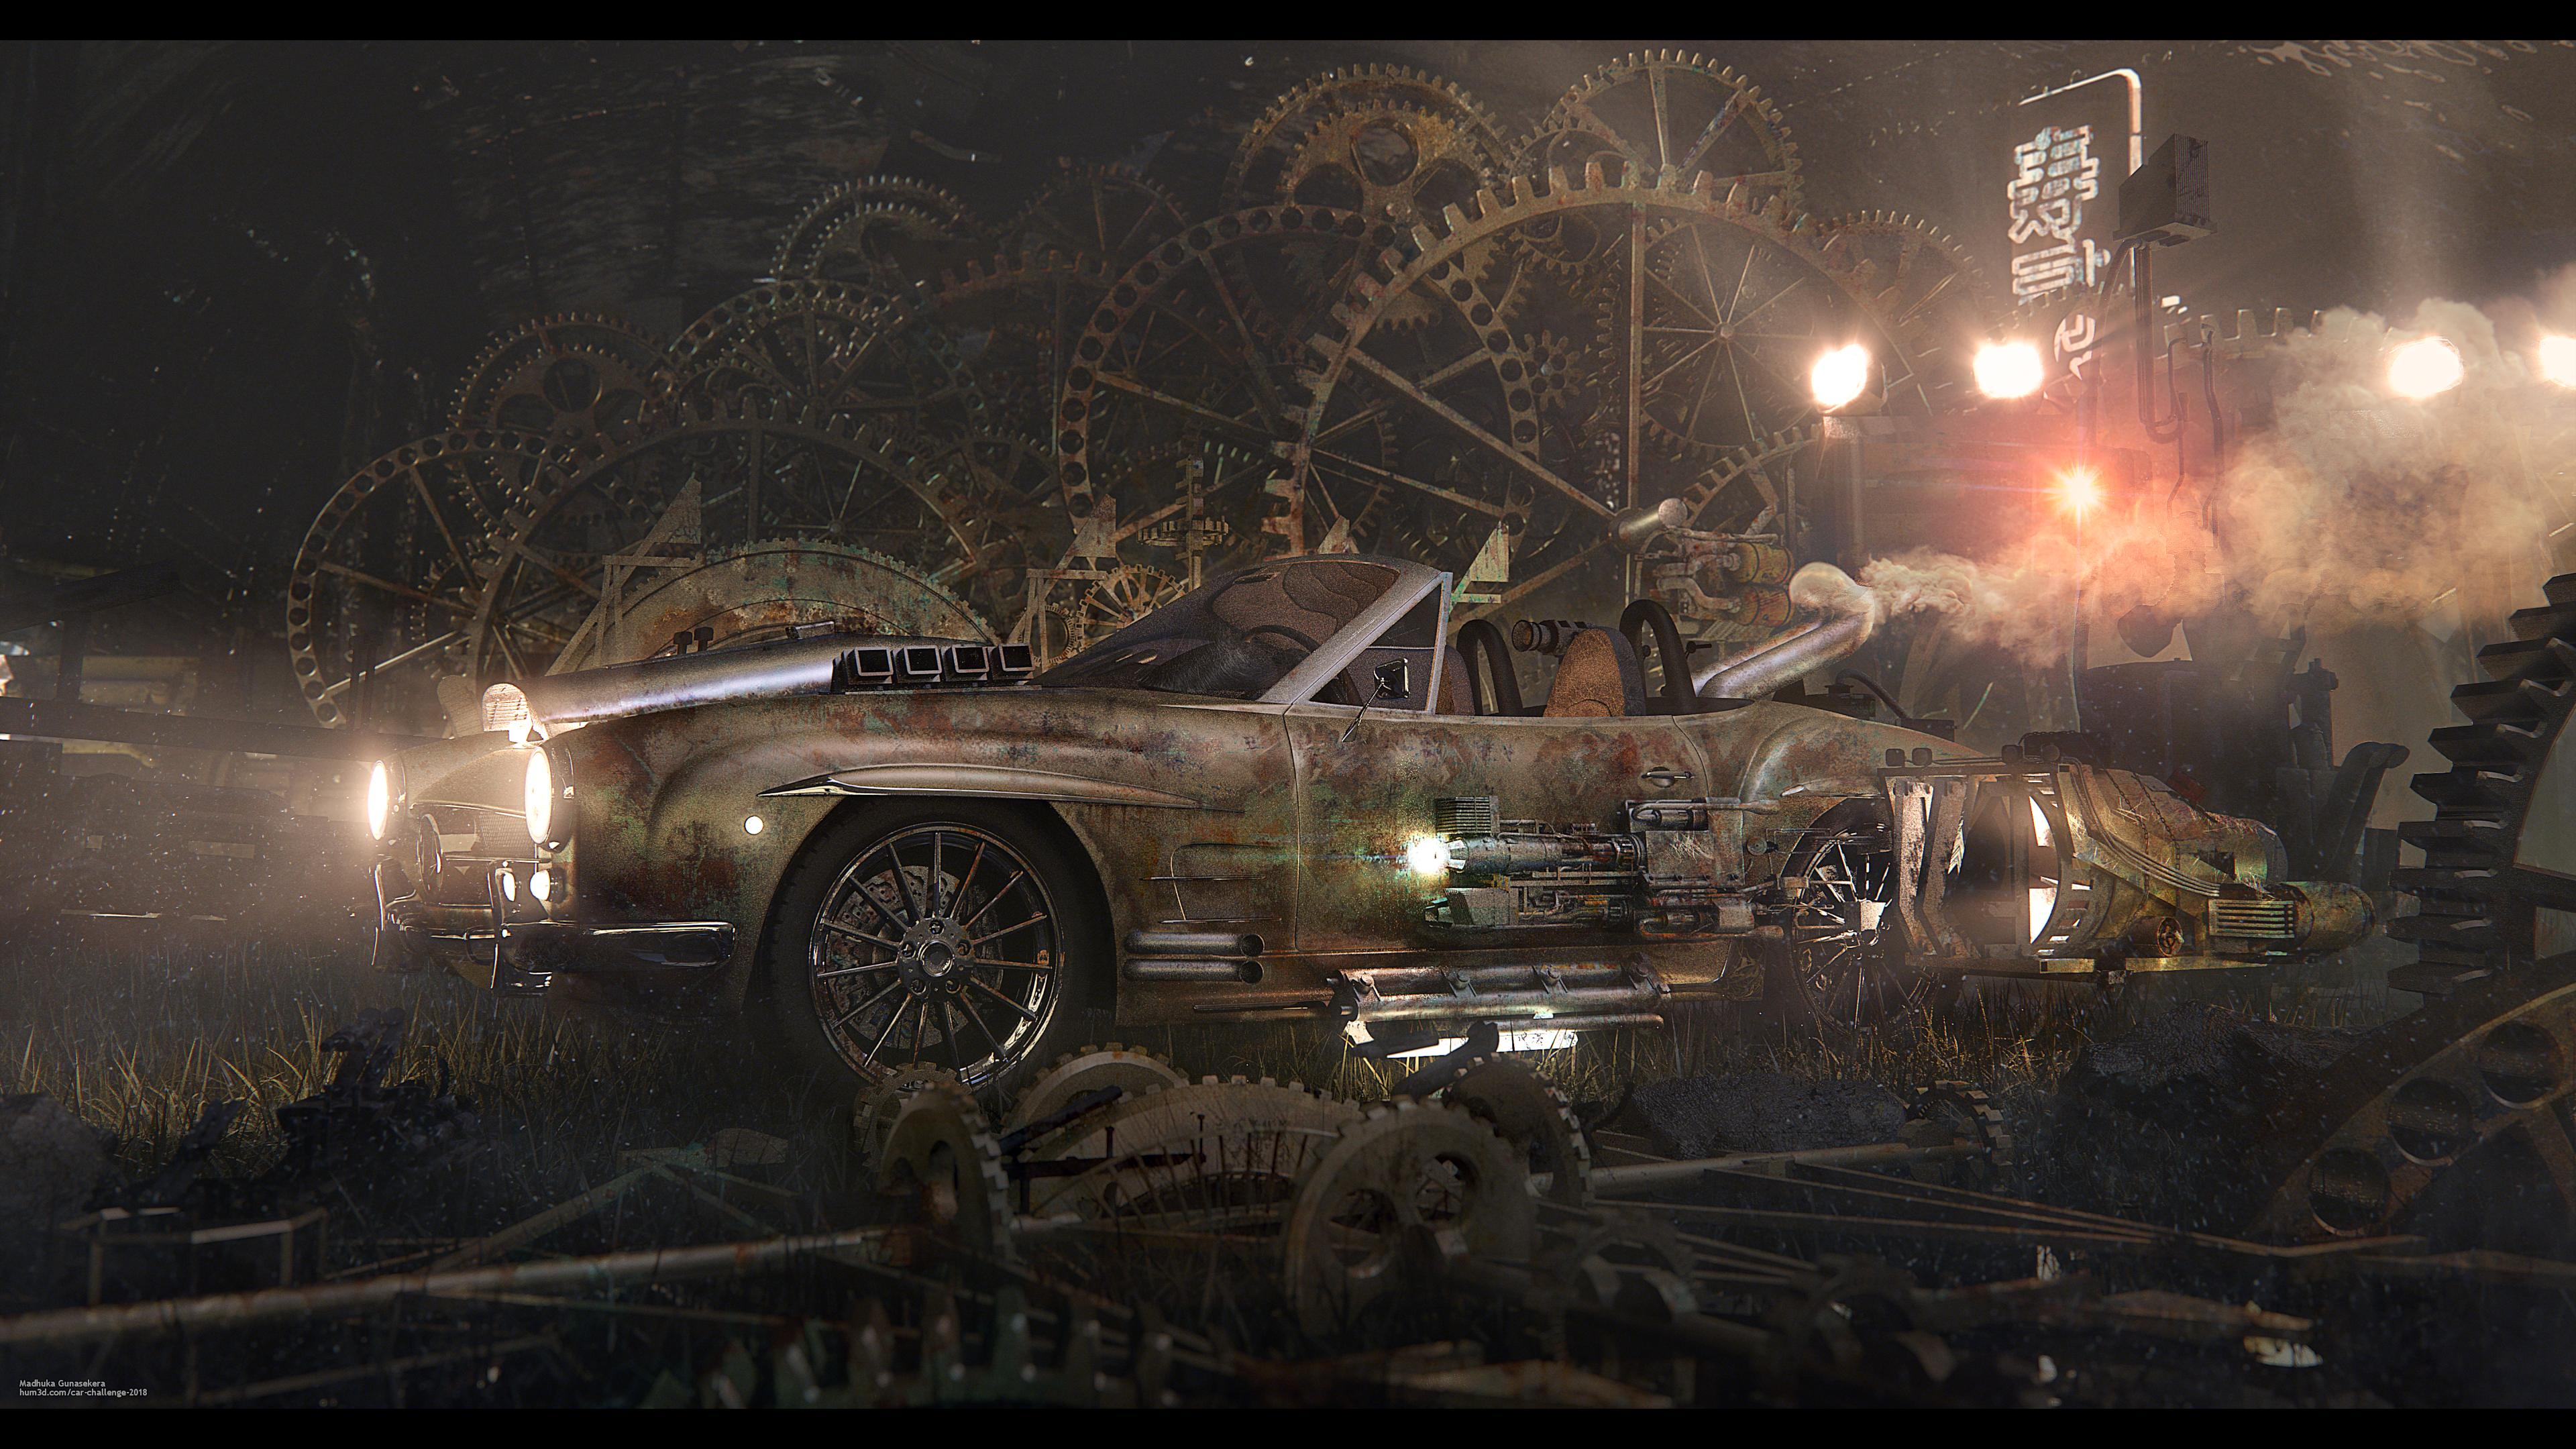 Time Machine 3d art